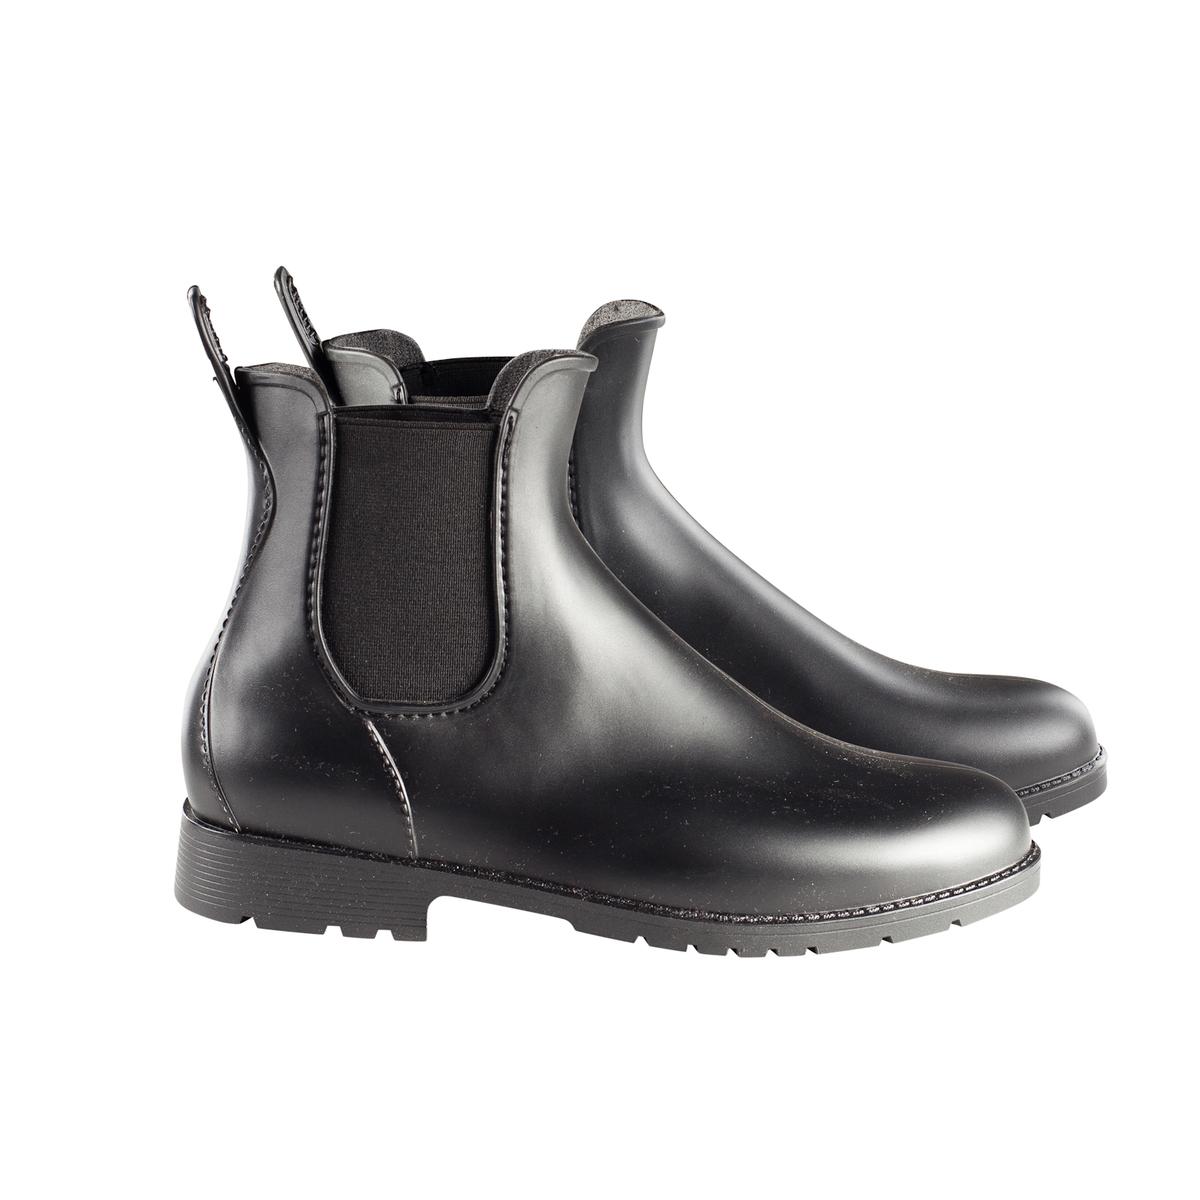 5137d02d87 Horze Palermo Rubber Paddock Boots | Horze